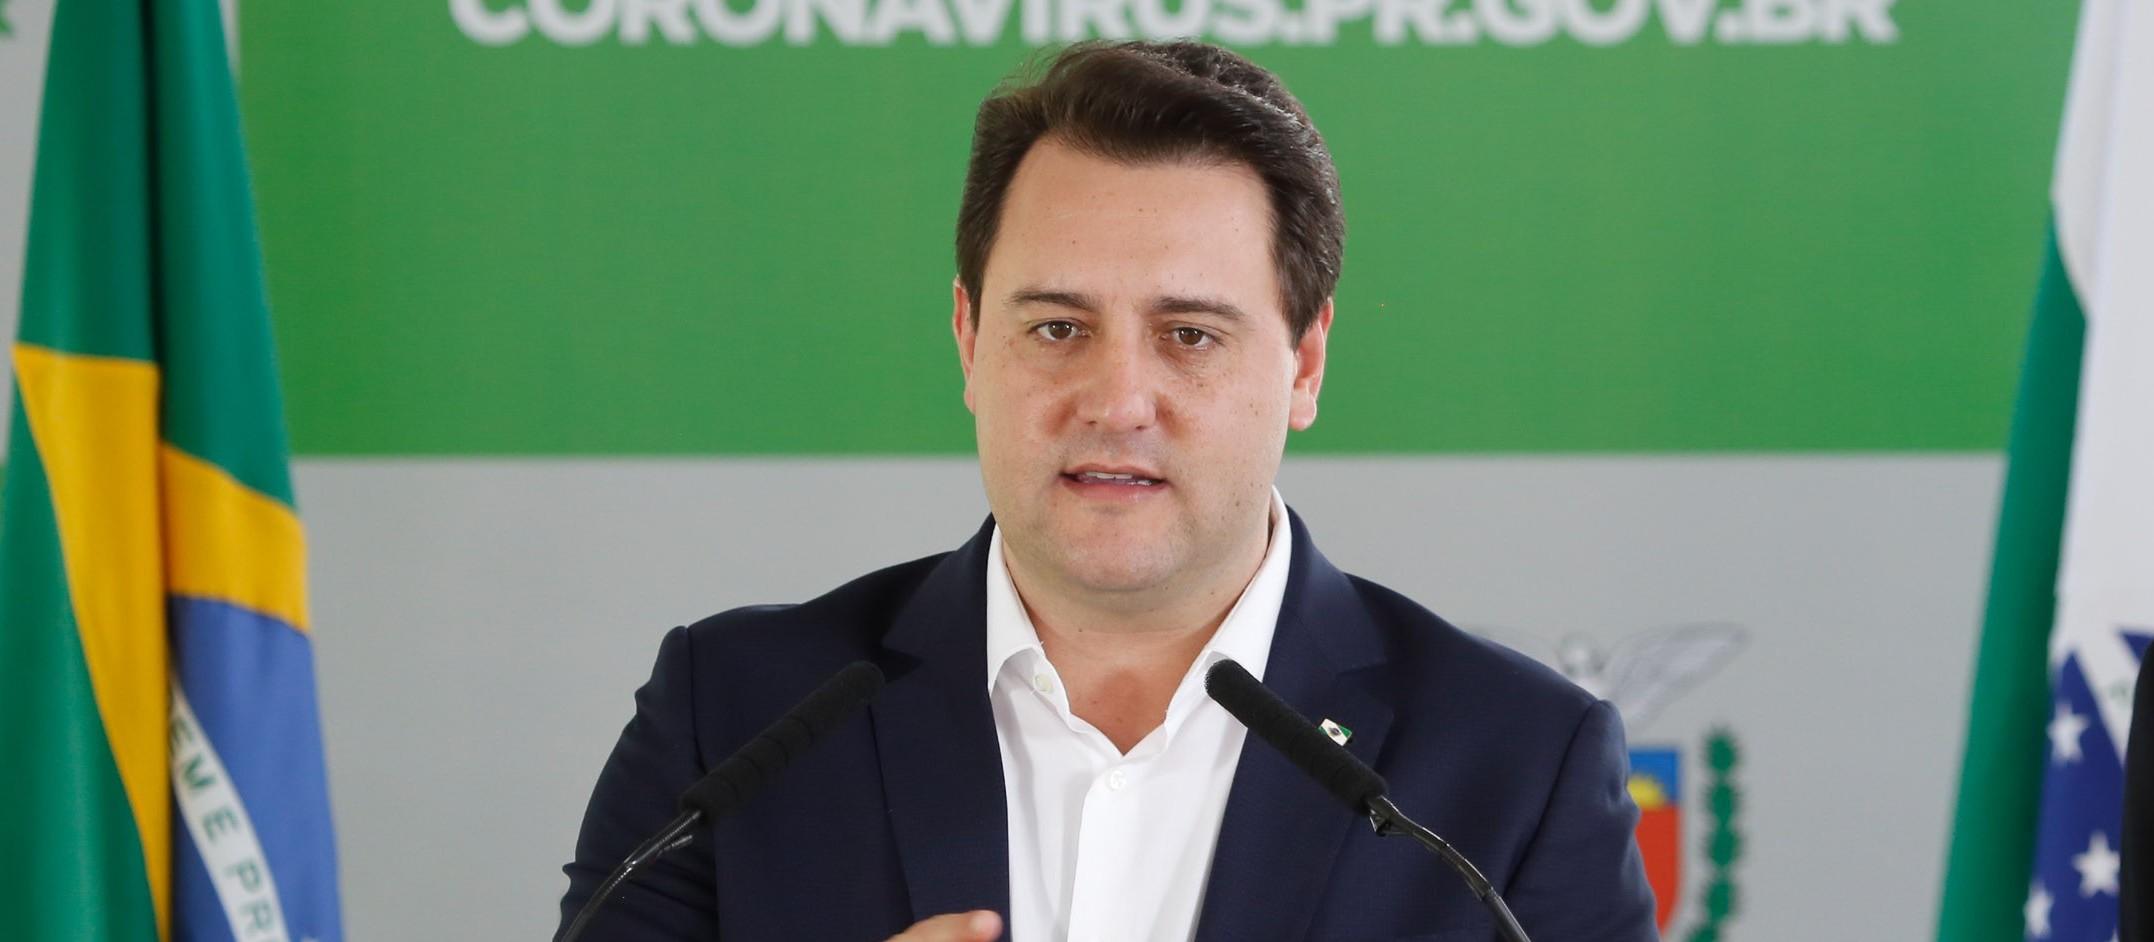 Coronavírus: Governo do Paraná amplia a compra de produtos da agricultura familiar